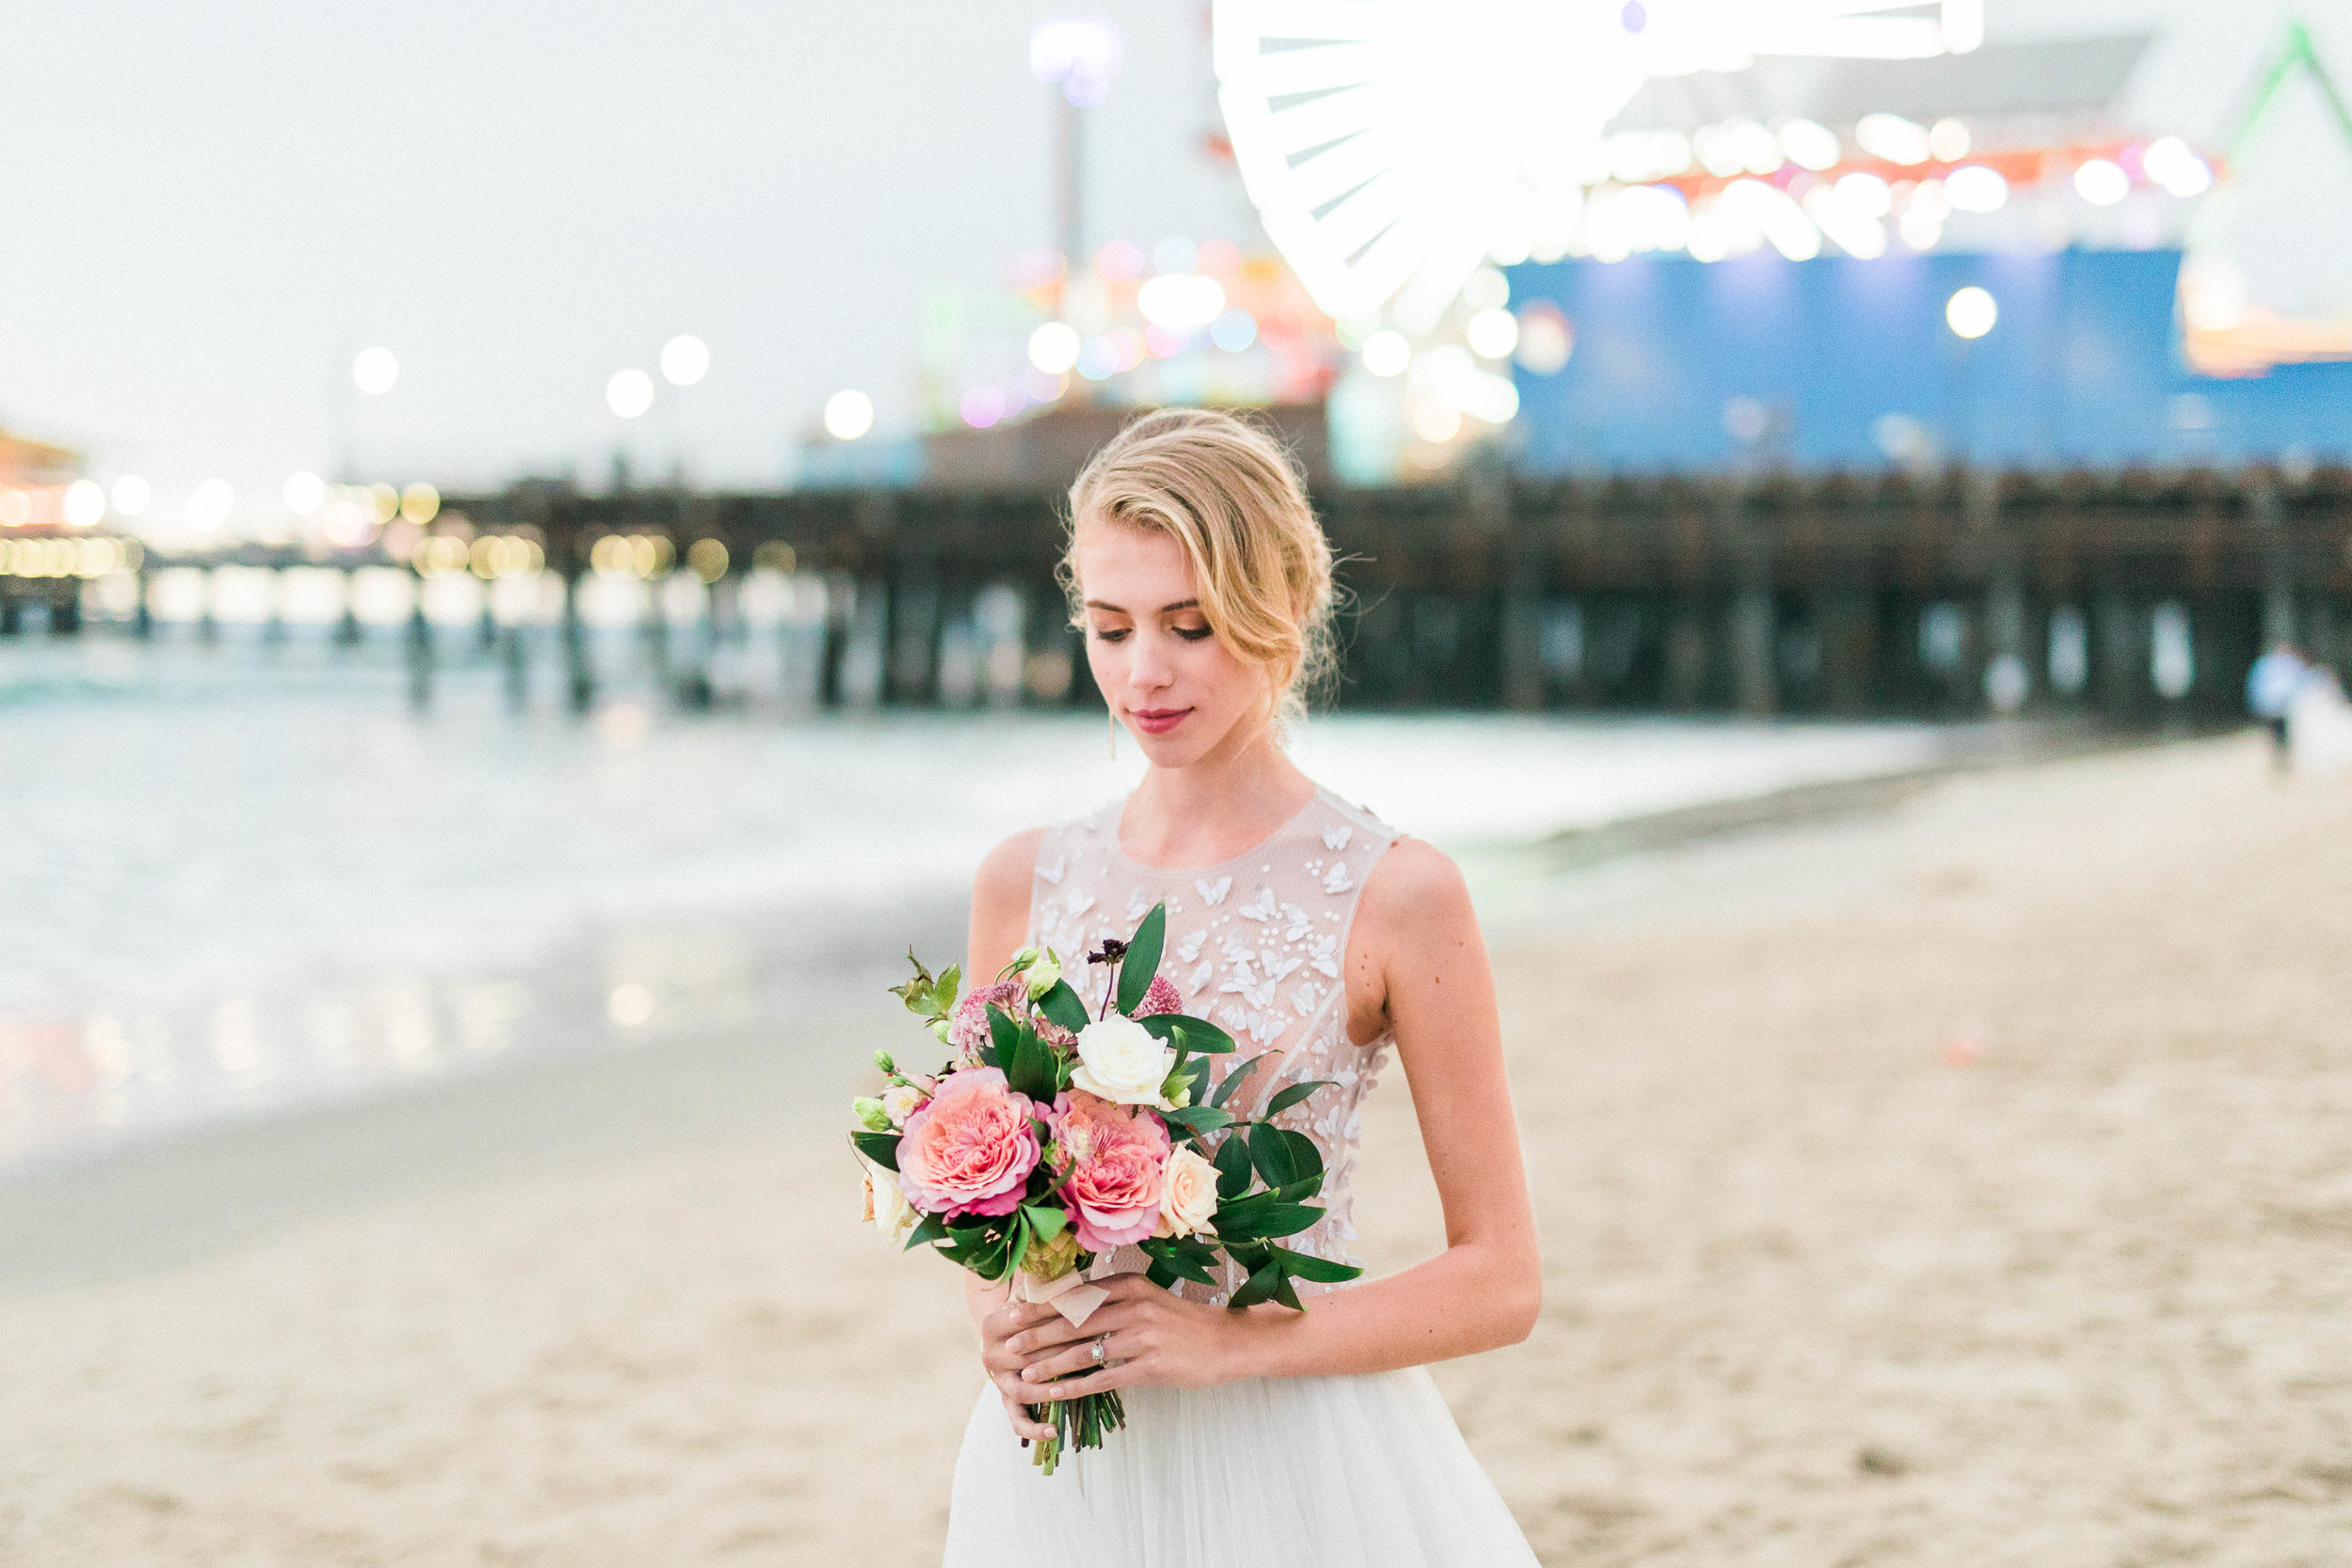 LA-Wedding-Shoot-by-JBJ-Pictures-190.jpg